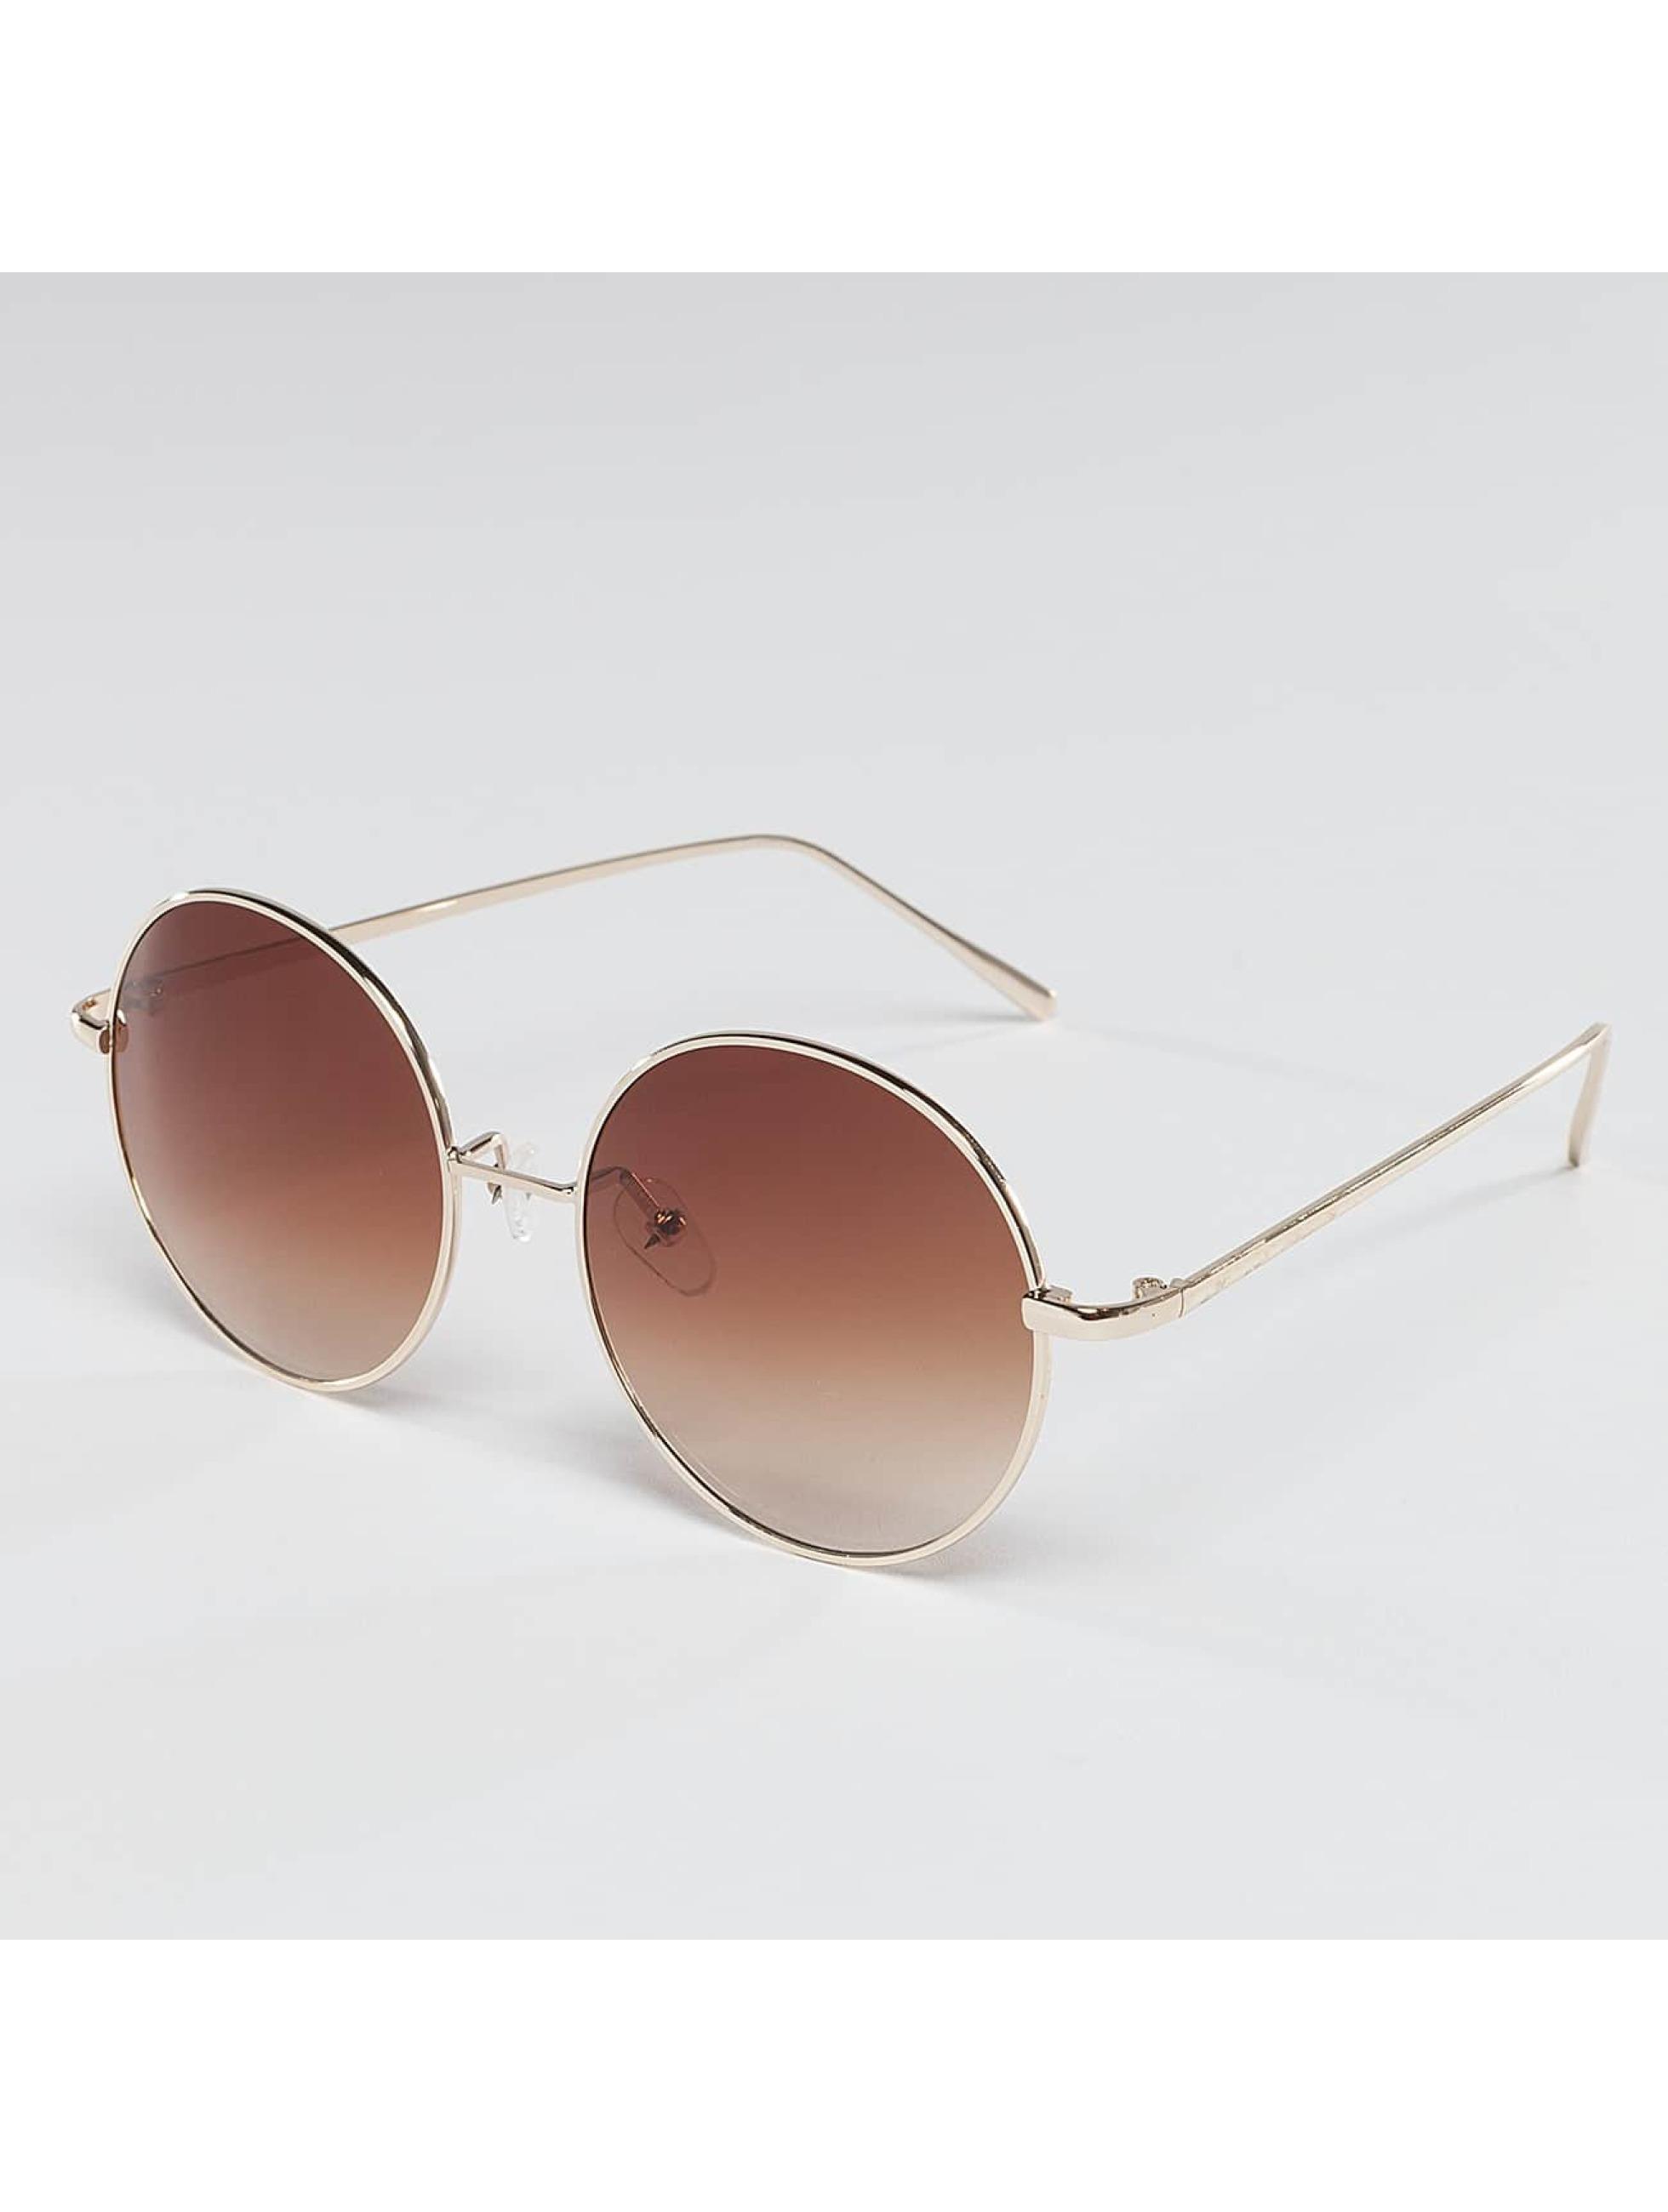 Hailys Sunglasses Luna gold colored